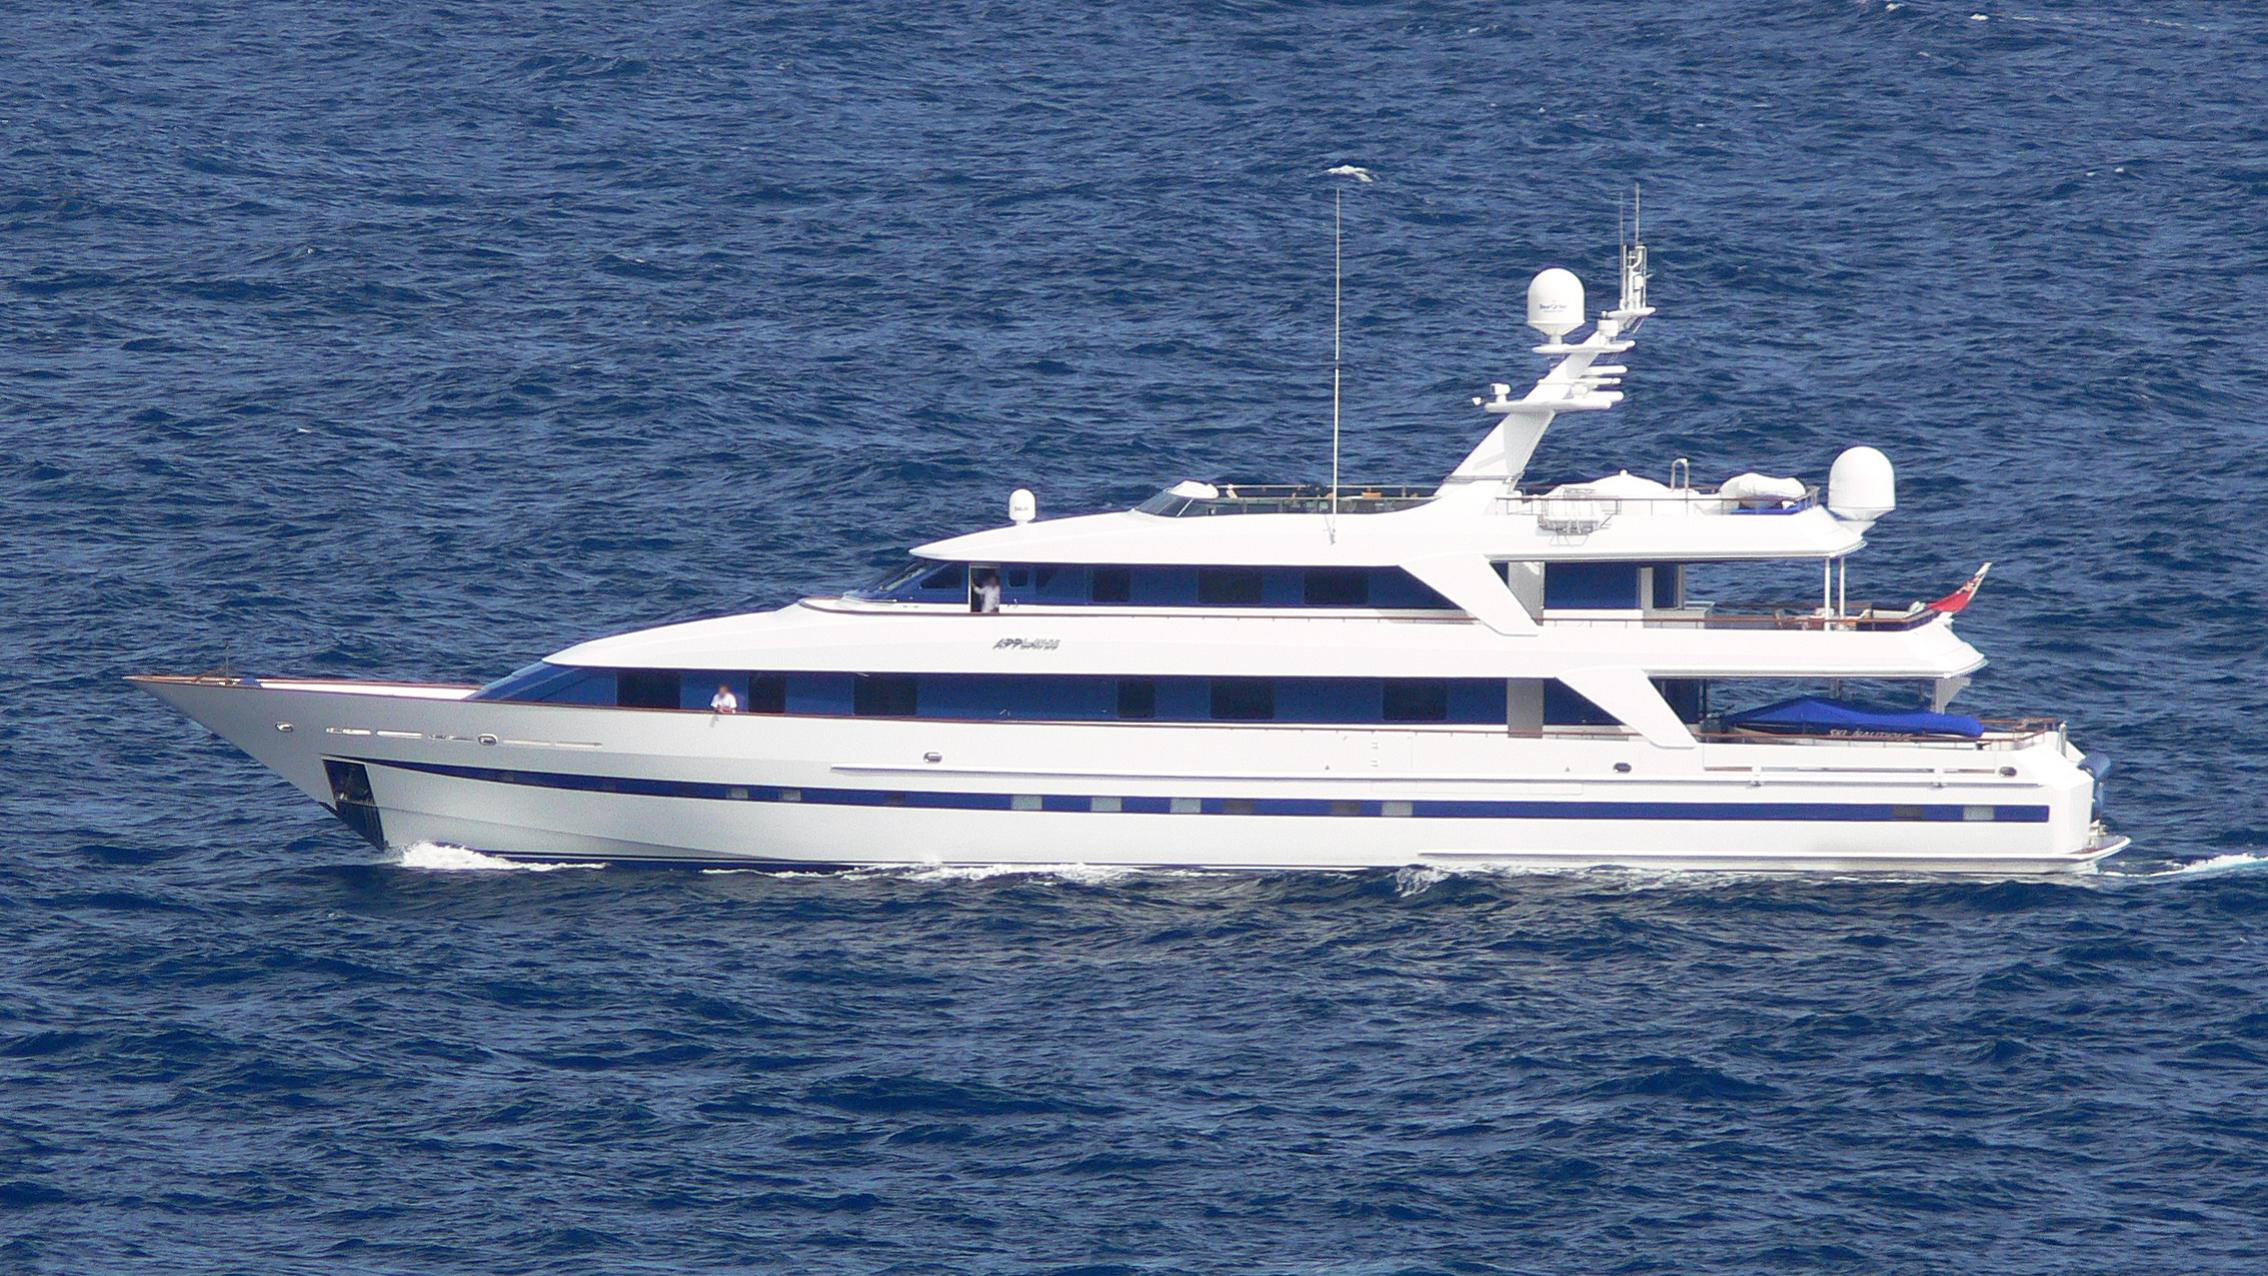 anna-j-jaan-2-yacht-exterior